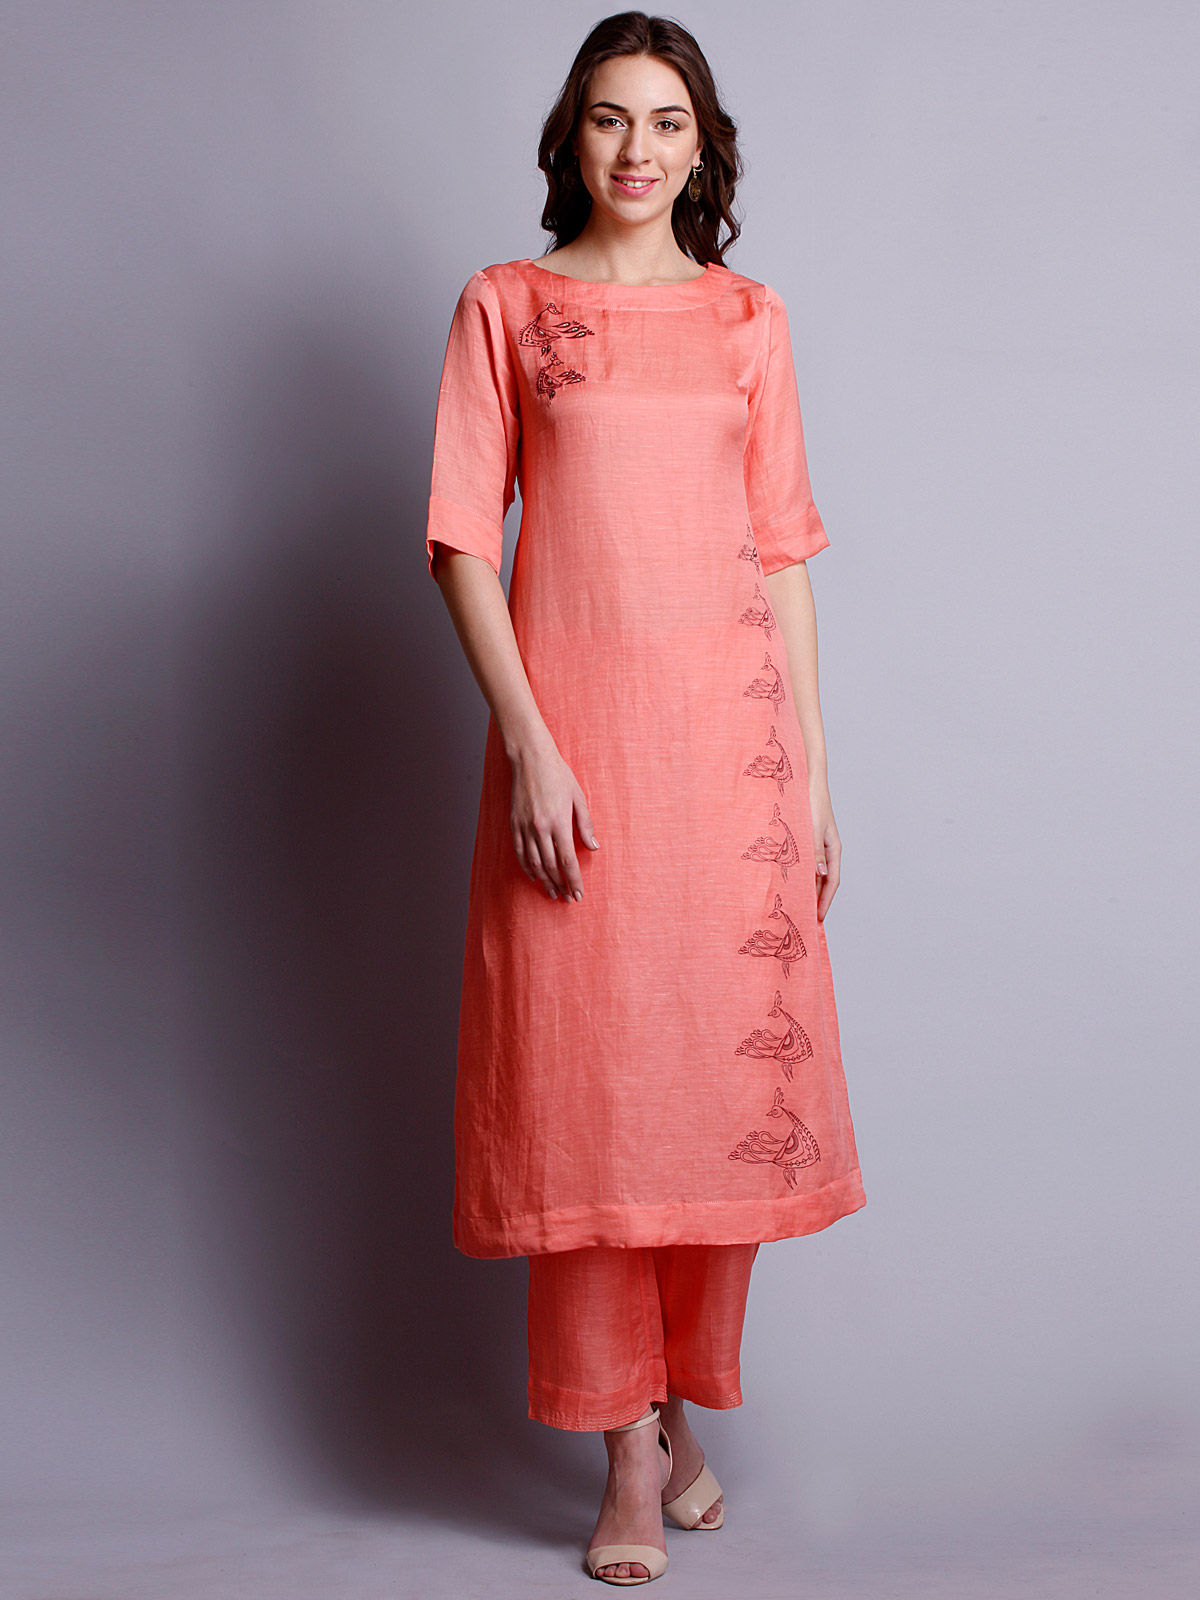 Peach color silk linen embroidered long kurta